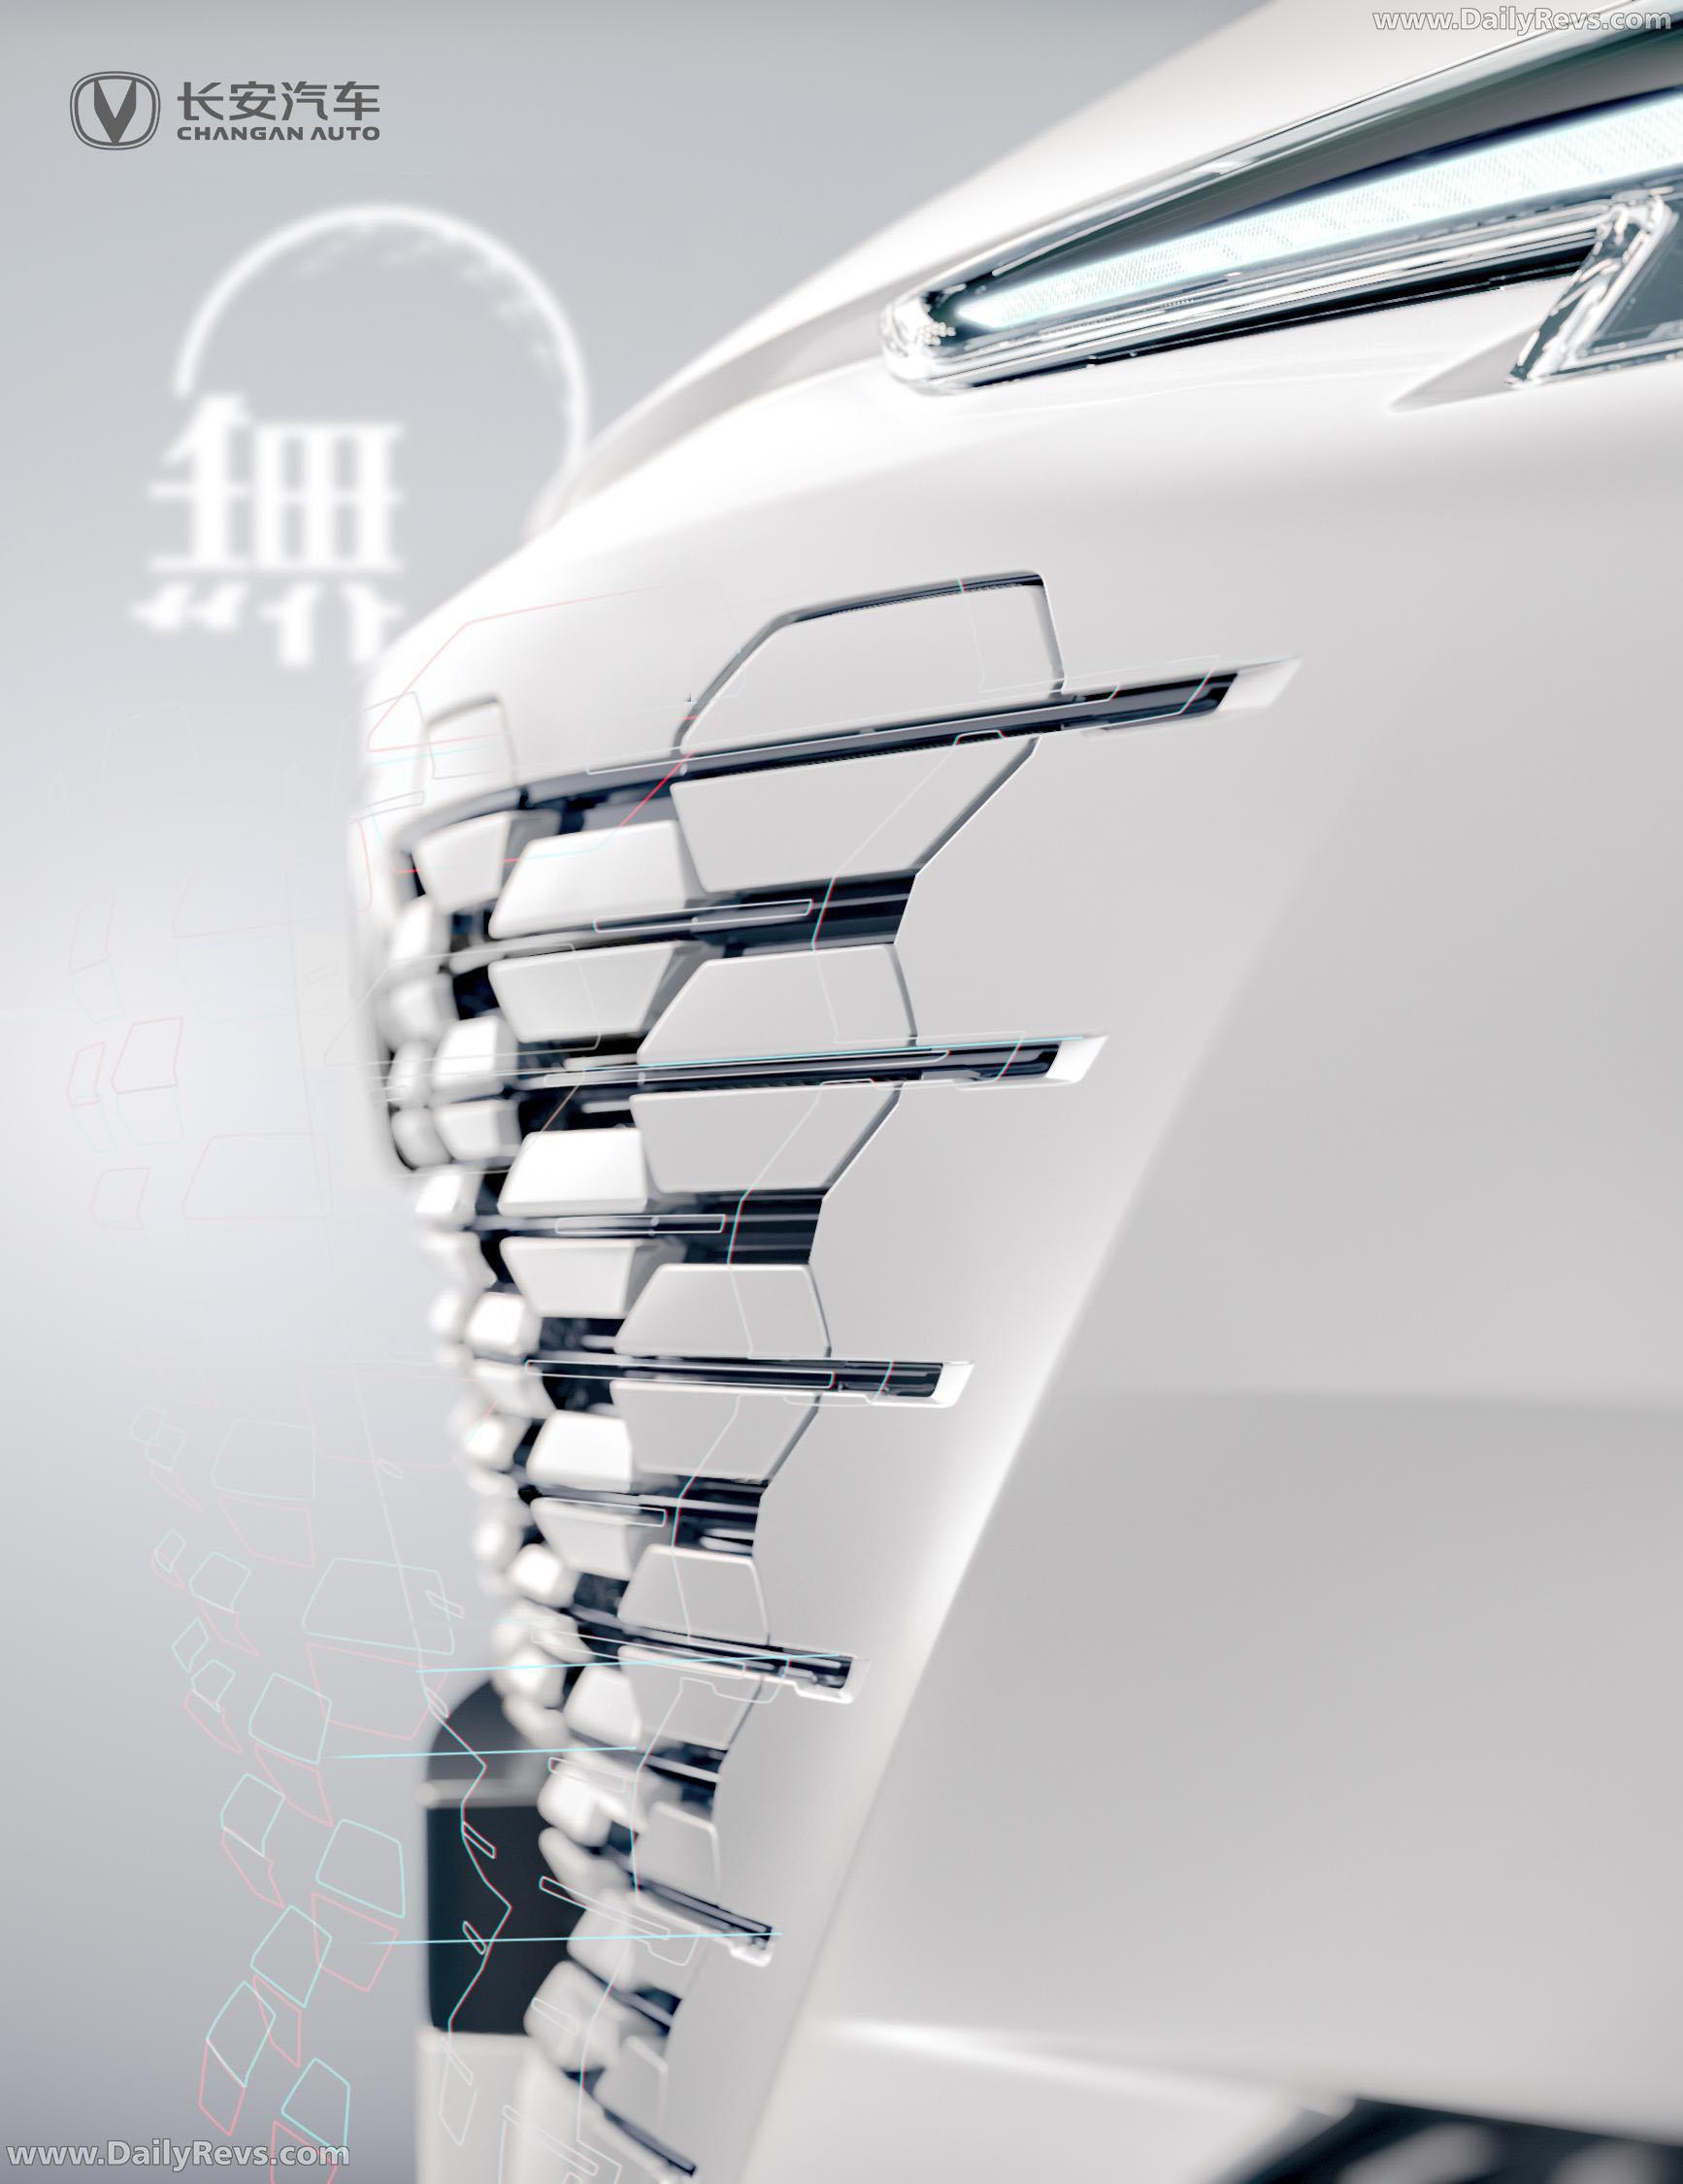 2020 Changan Auto UNI-K full